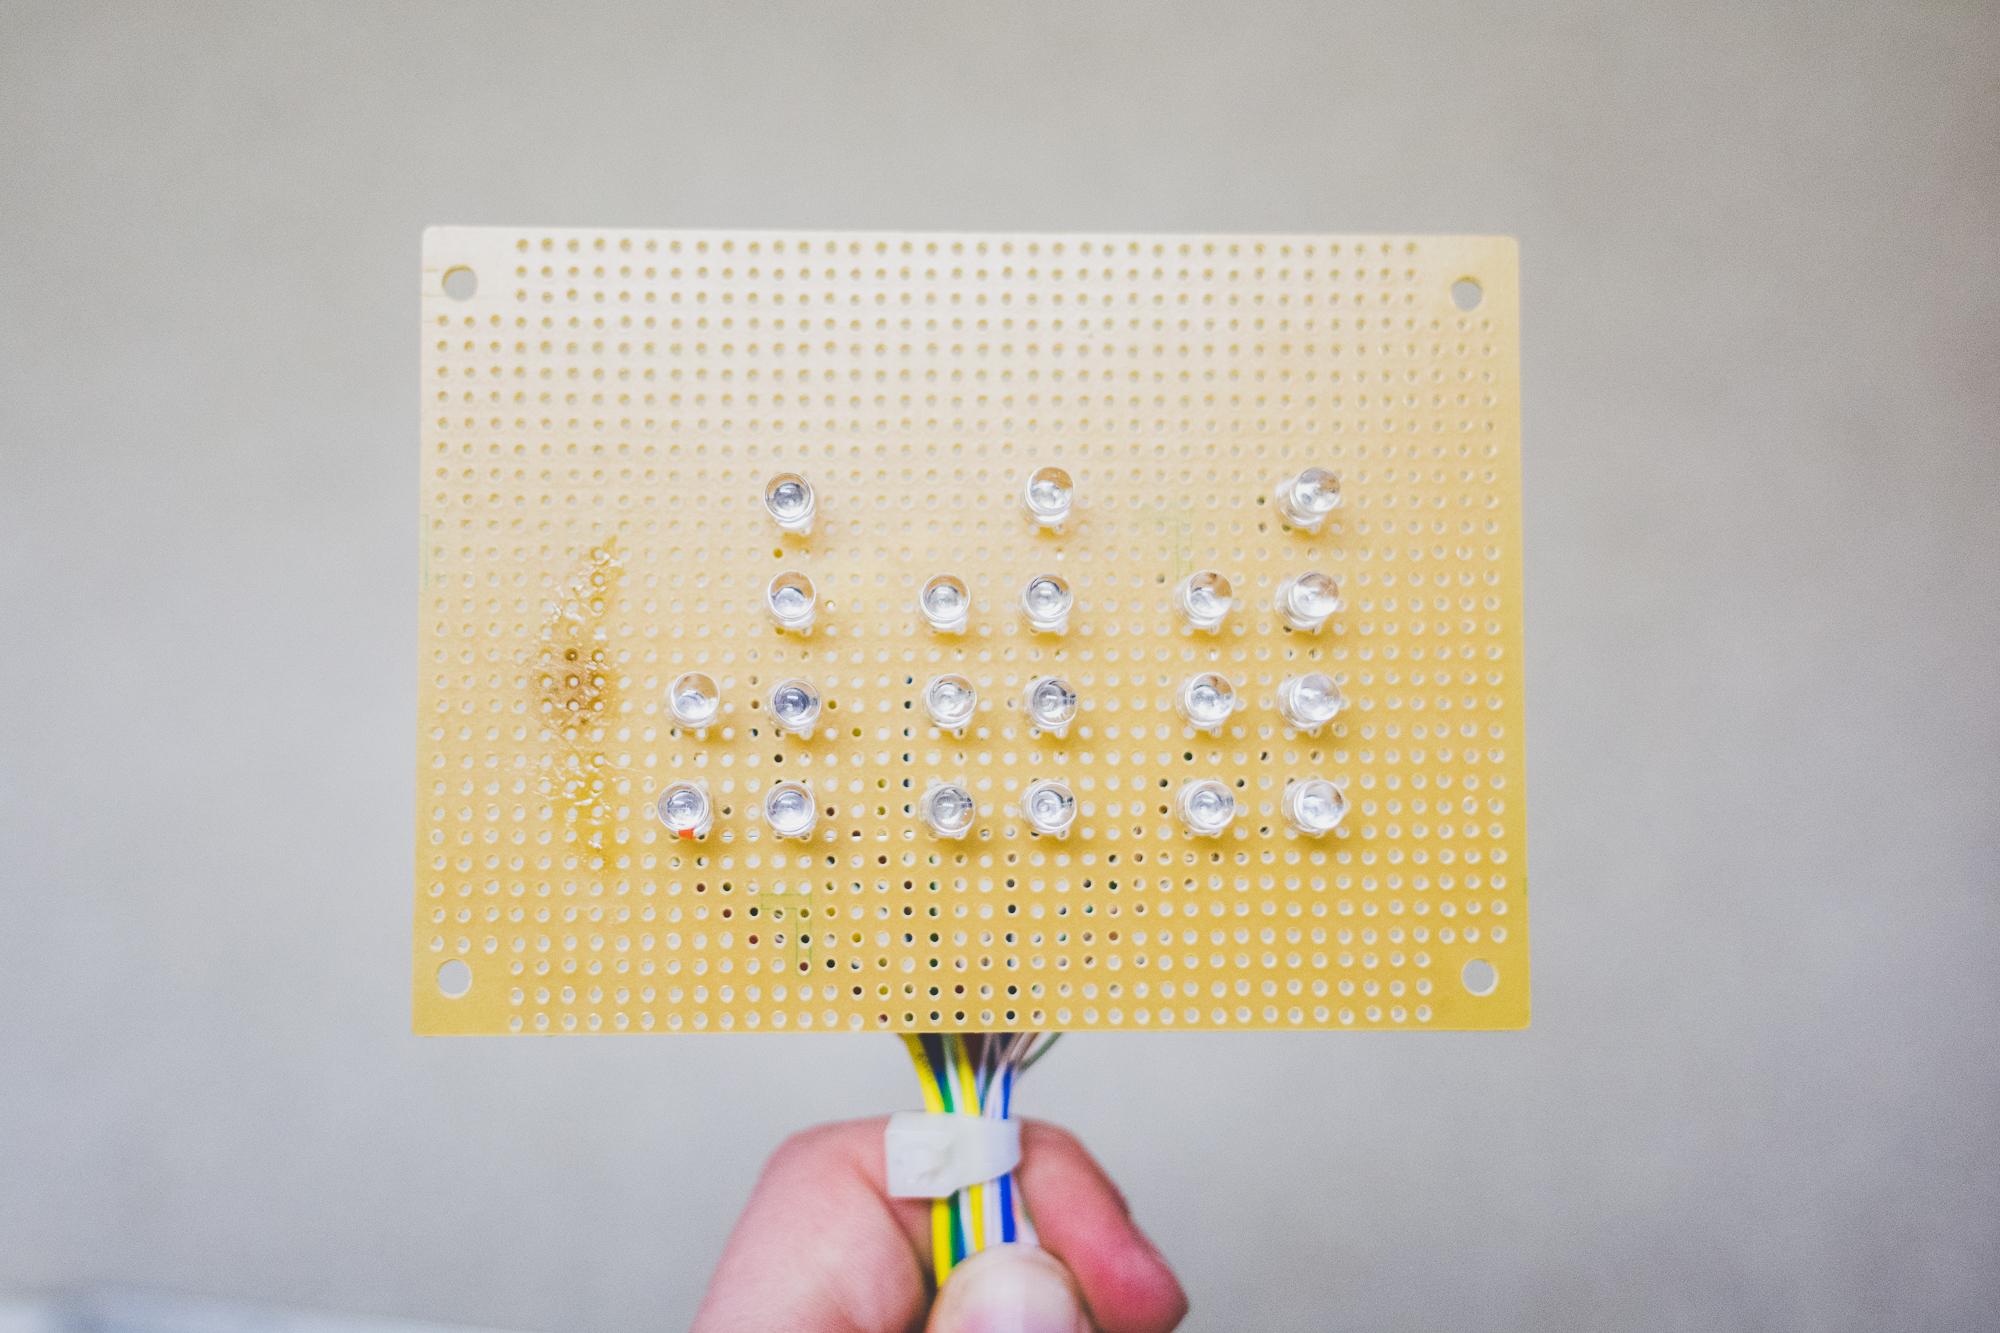 Prototyping LED Display